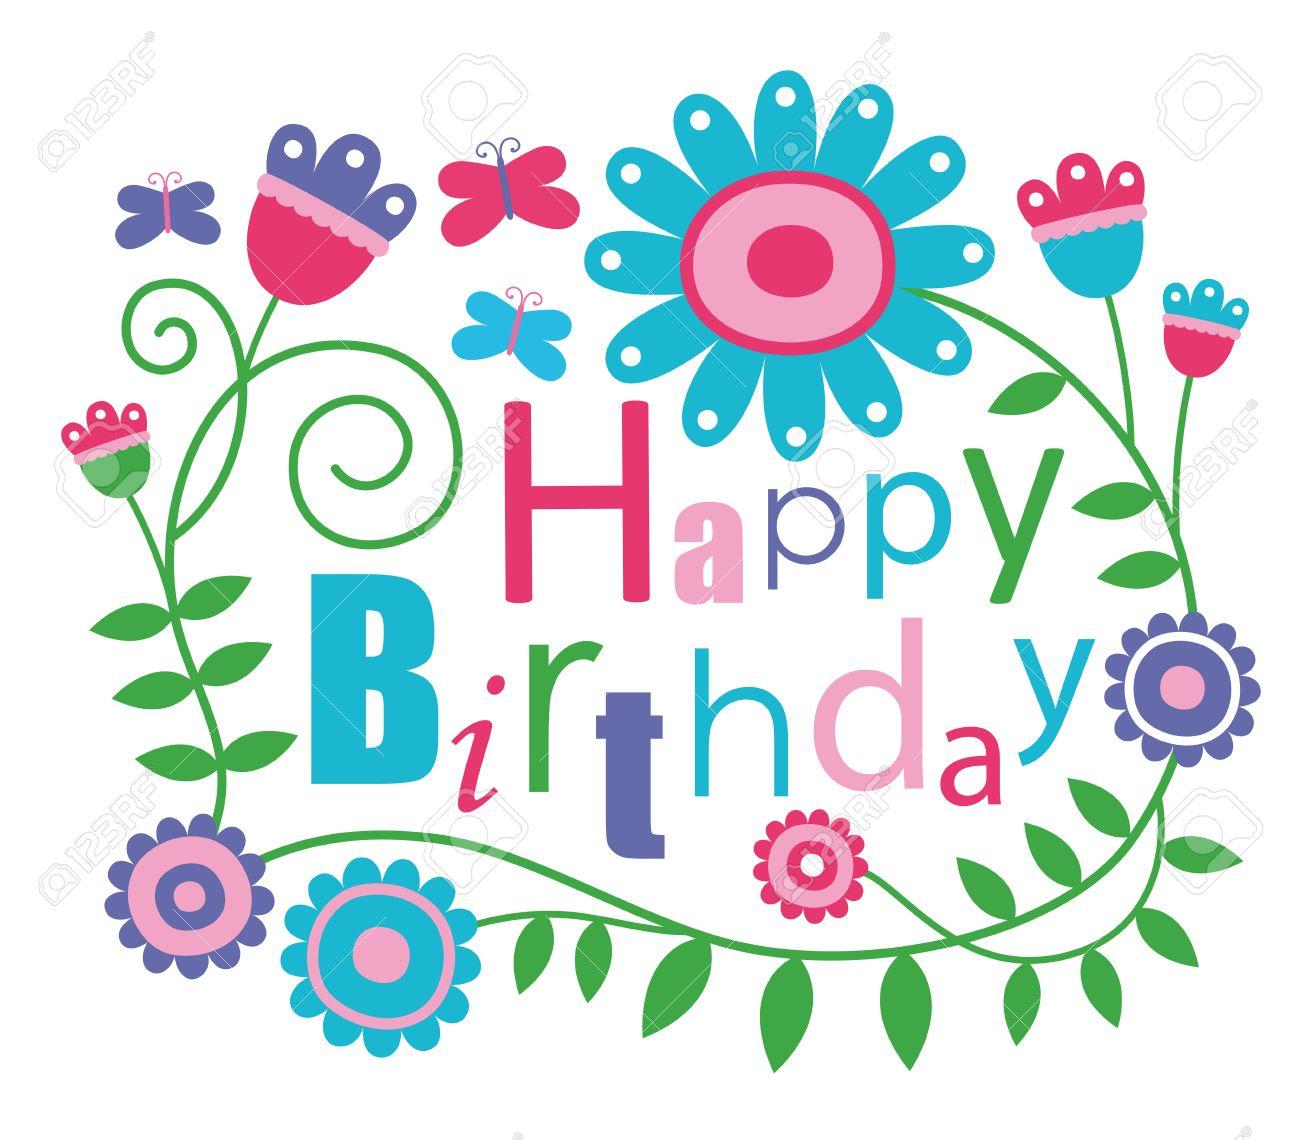 Cute Happy Birthday Card Royalty Free Cliparts Vectors And – Happy Birthday Cards Cute